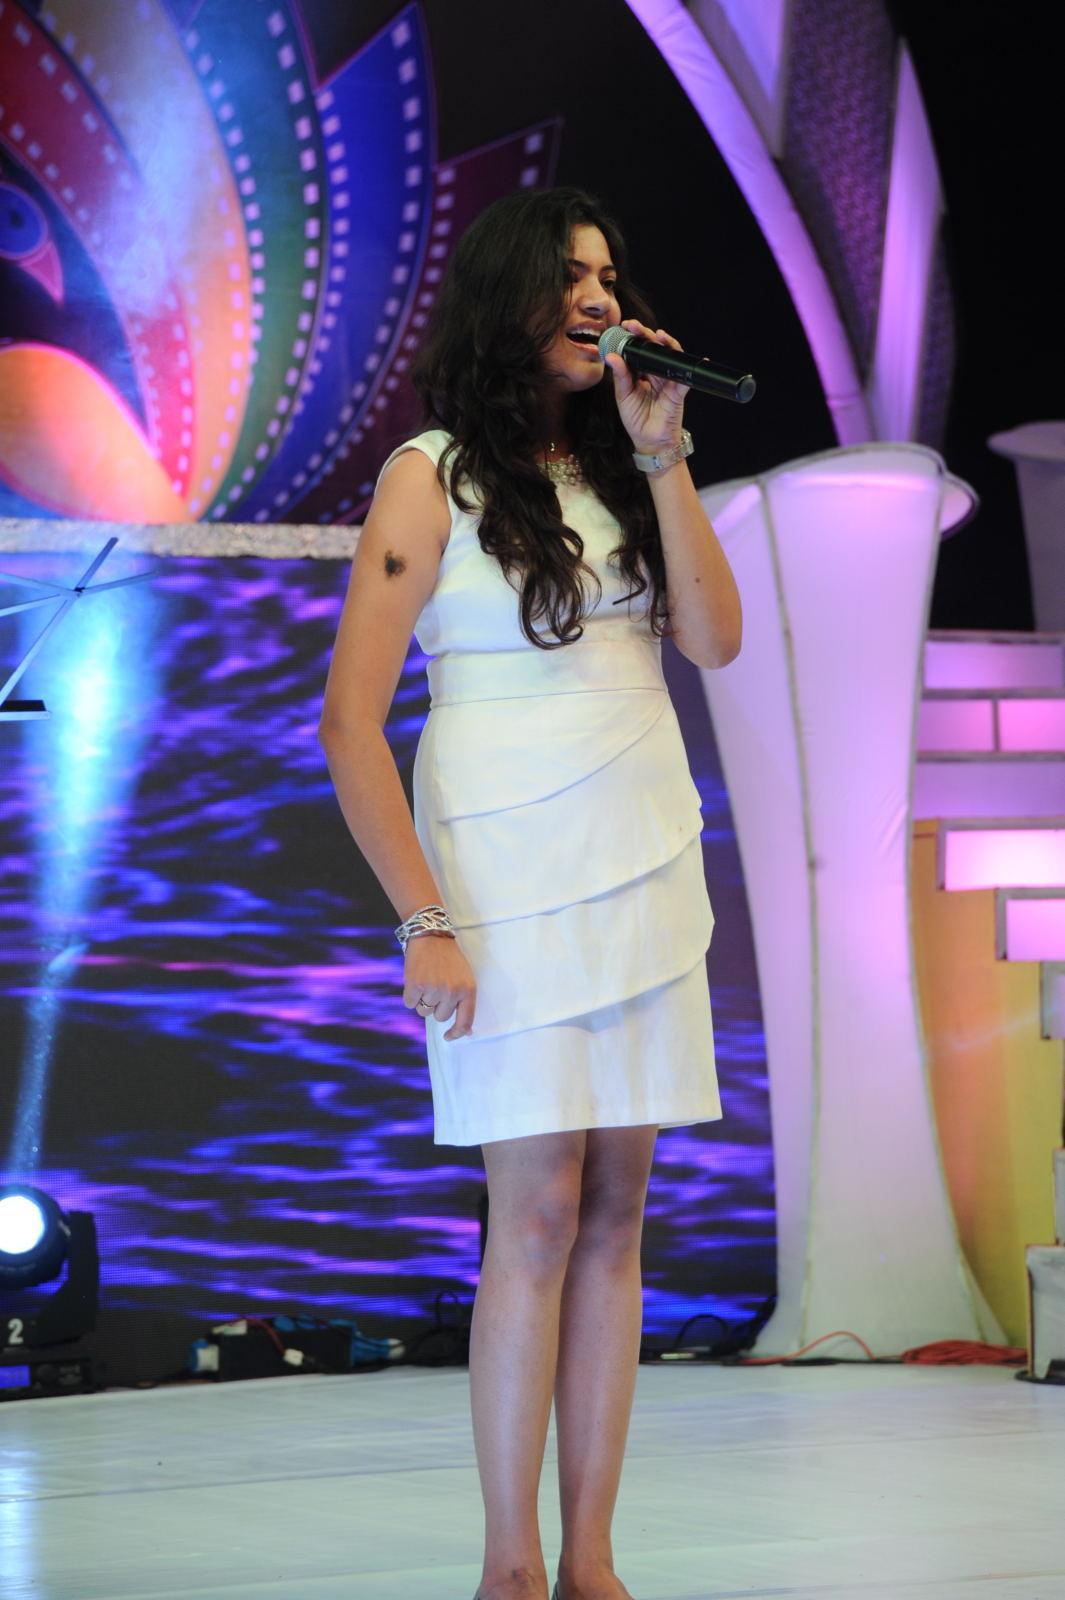 Geetha madhuri photos of performing at tollywood tv launch